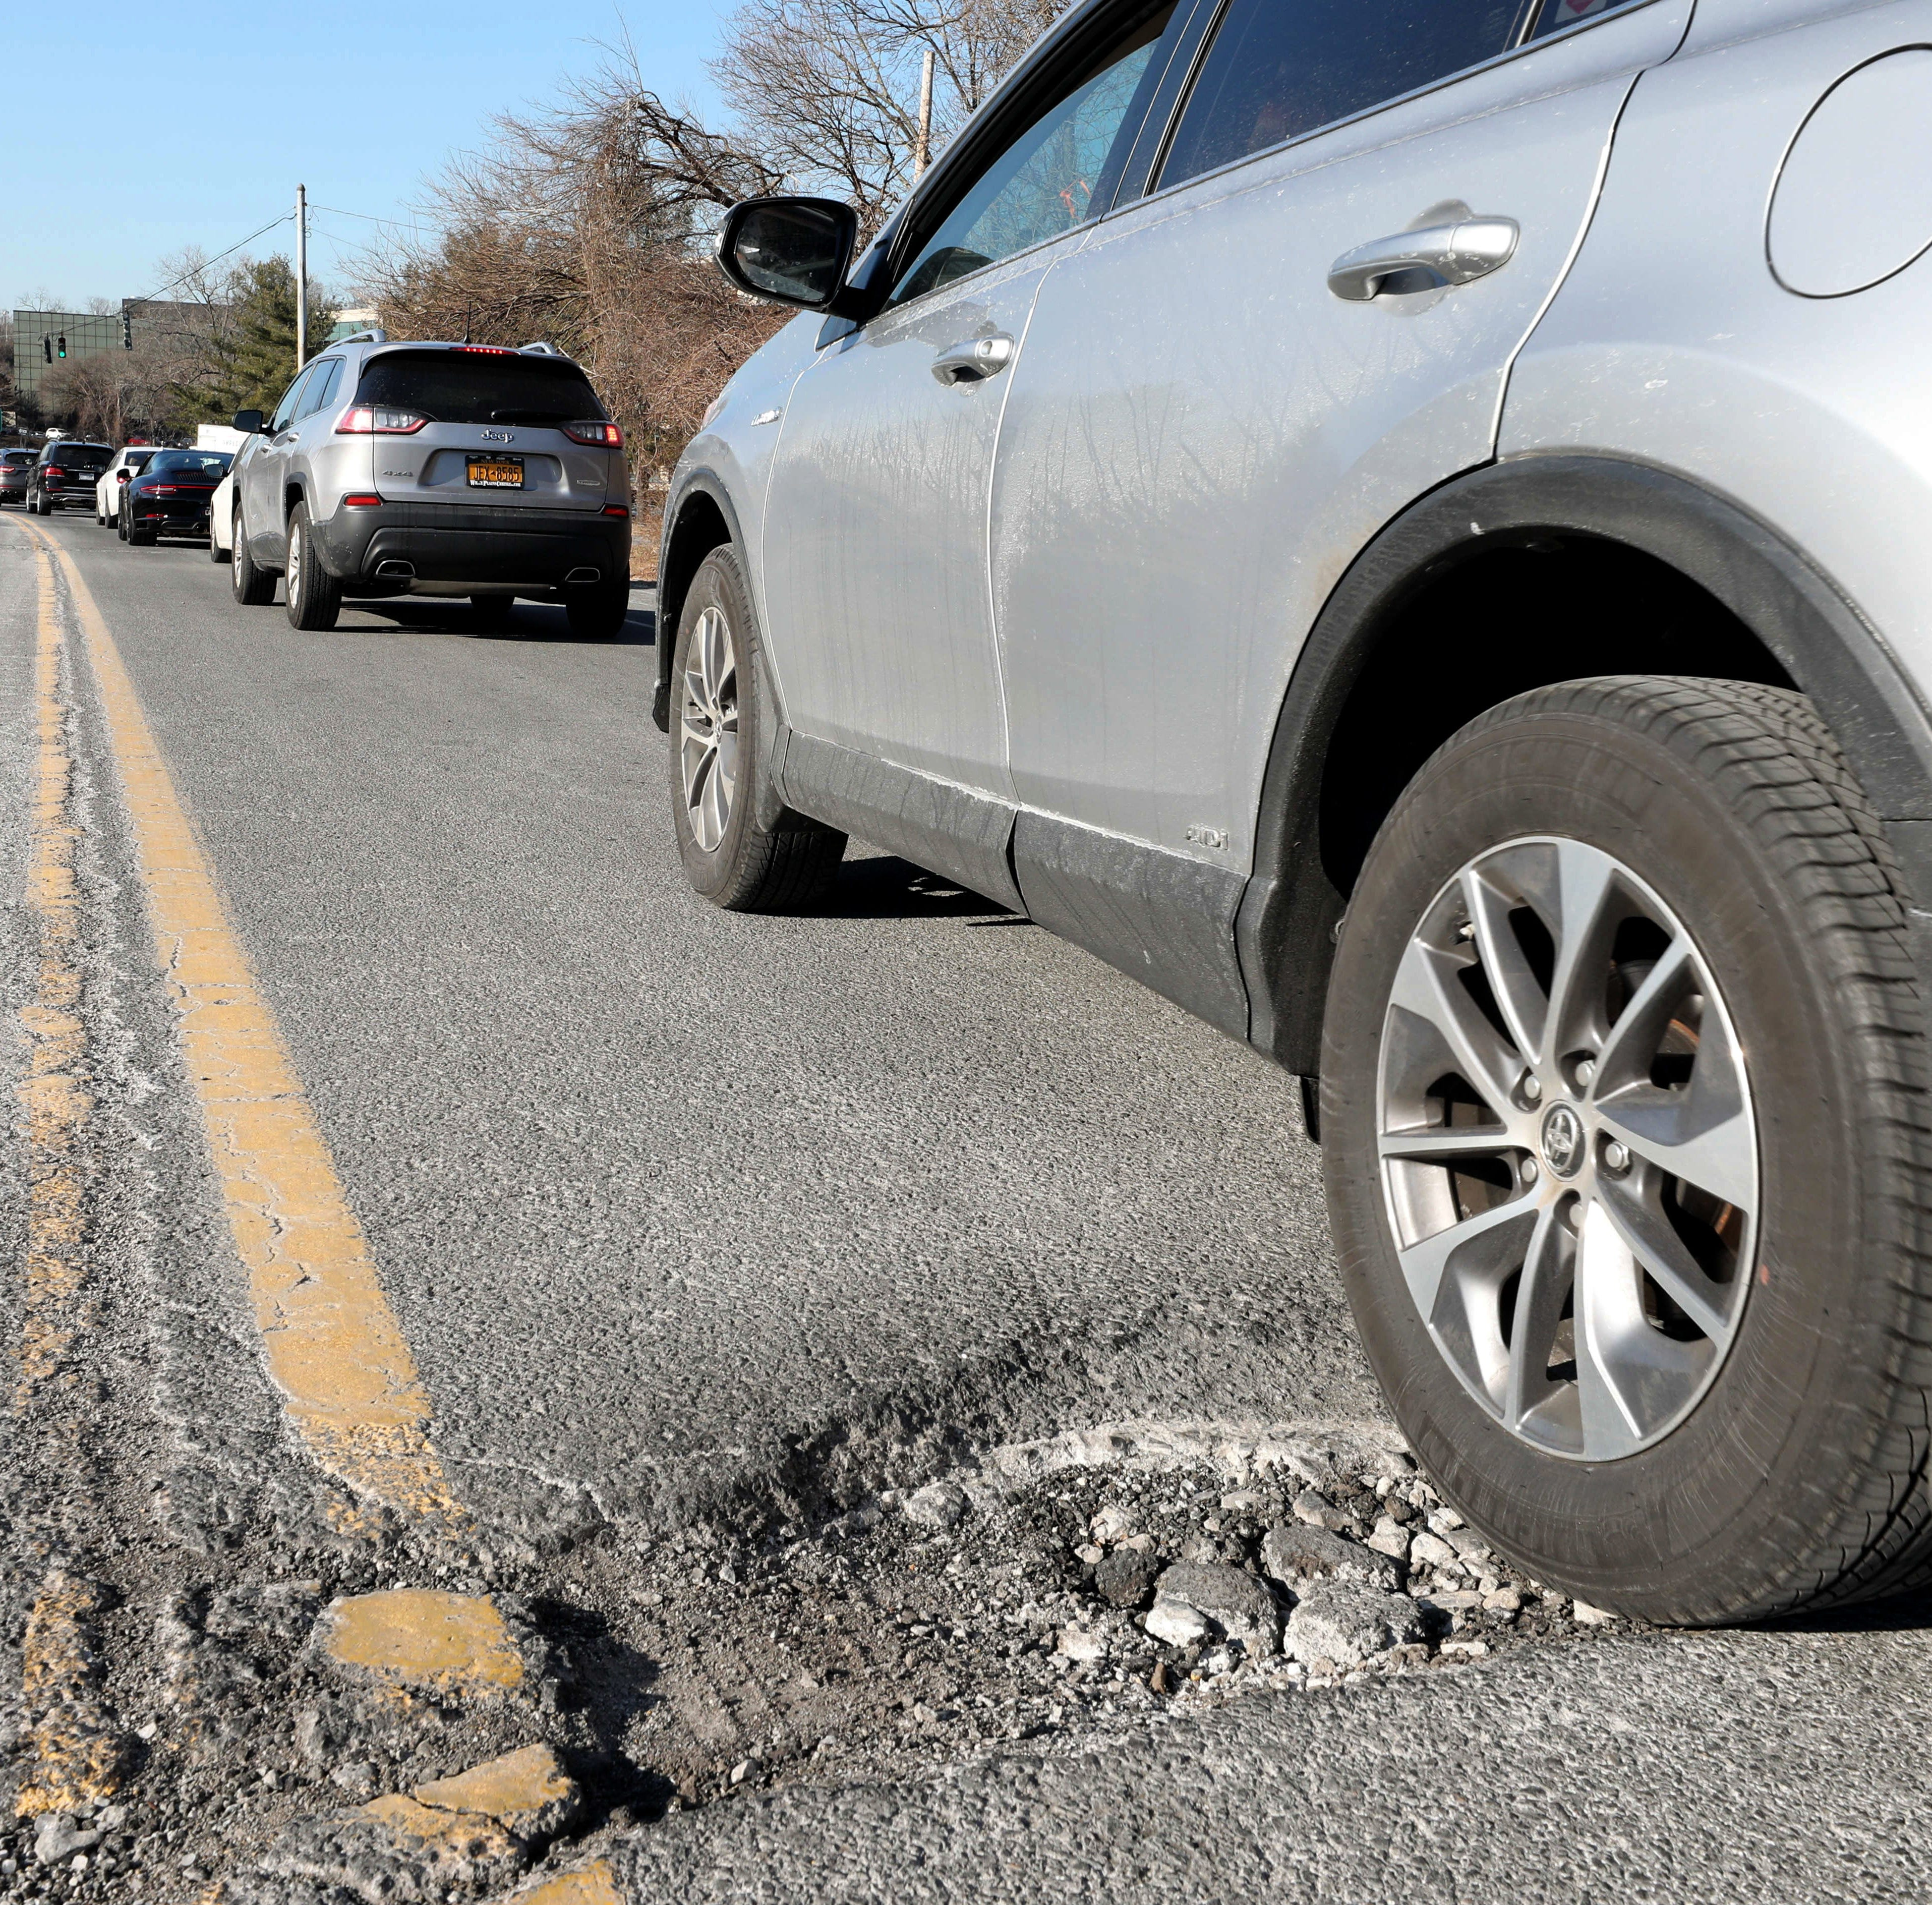 A large pothole is pictured along Webb Avenue in Harrison, Feb. 5, 2019.